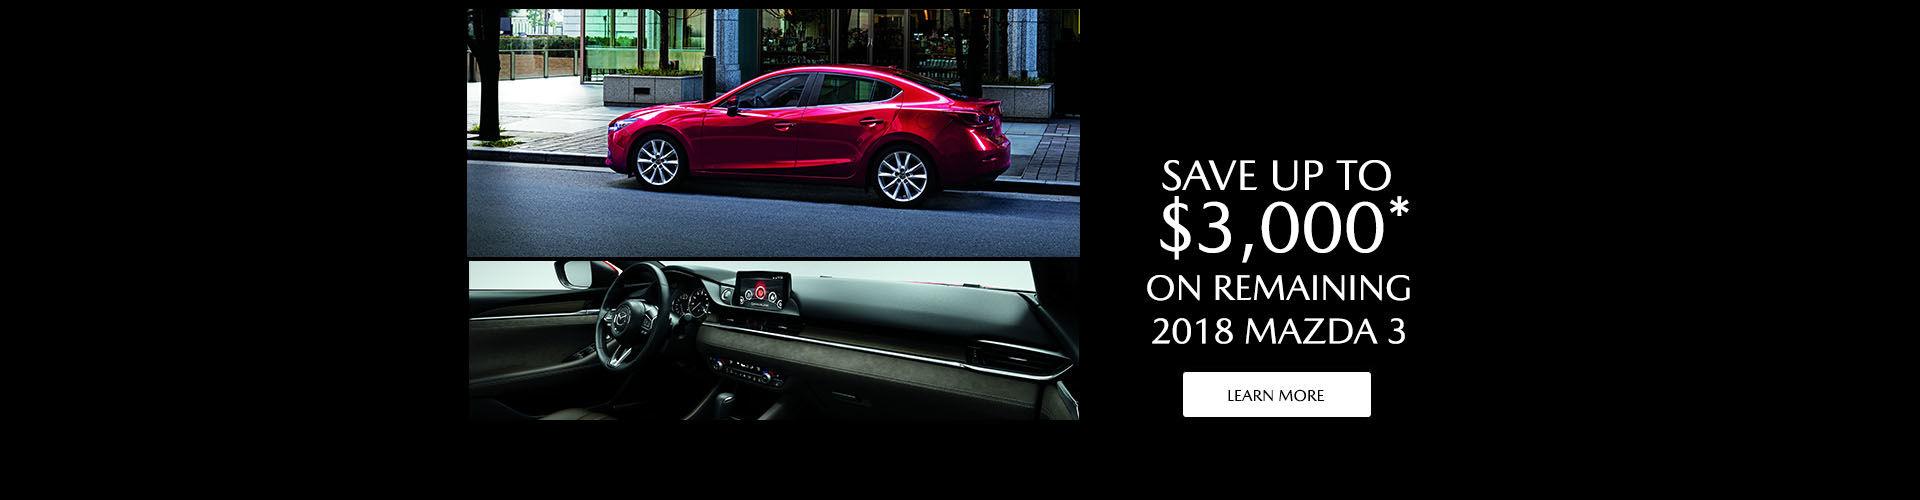 2018 Mazda Clearance